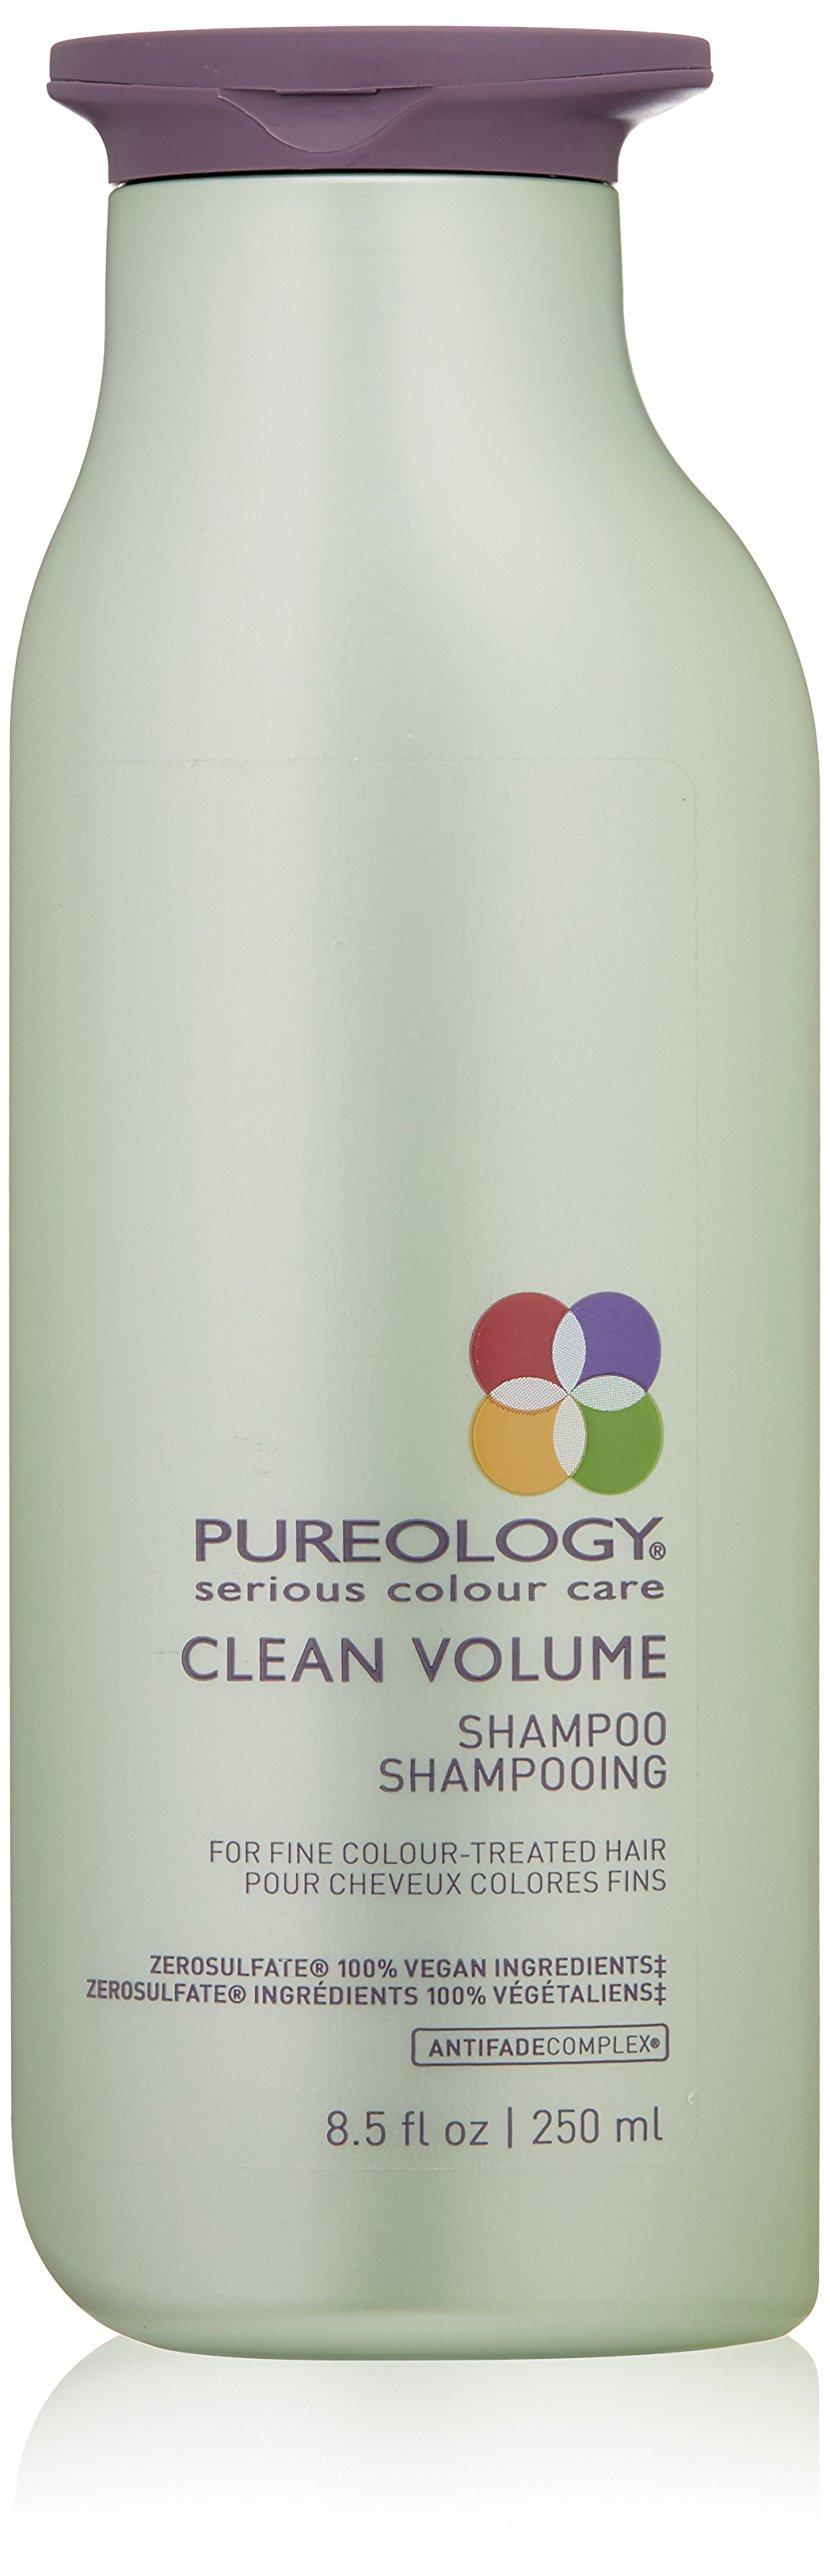 Pureology Clean Volume Shampoo, 8.5 fl. oz. by Pureology